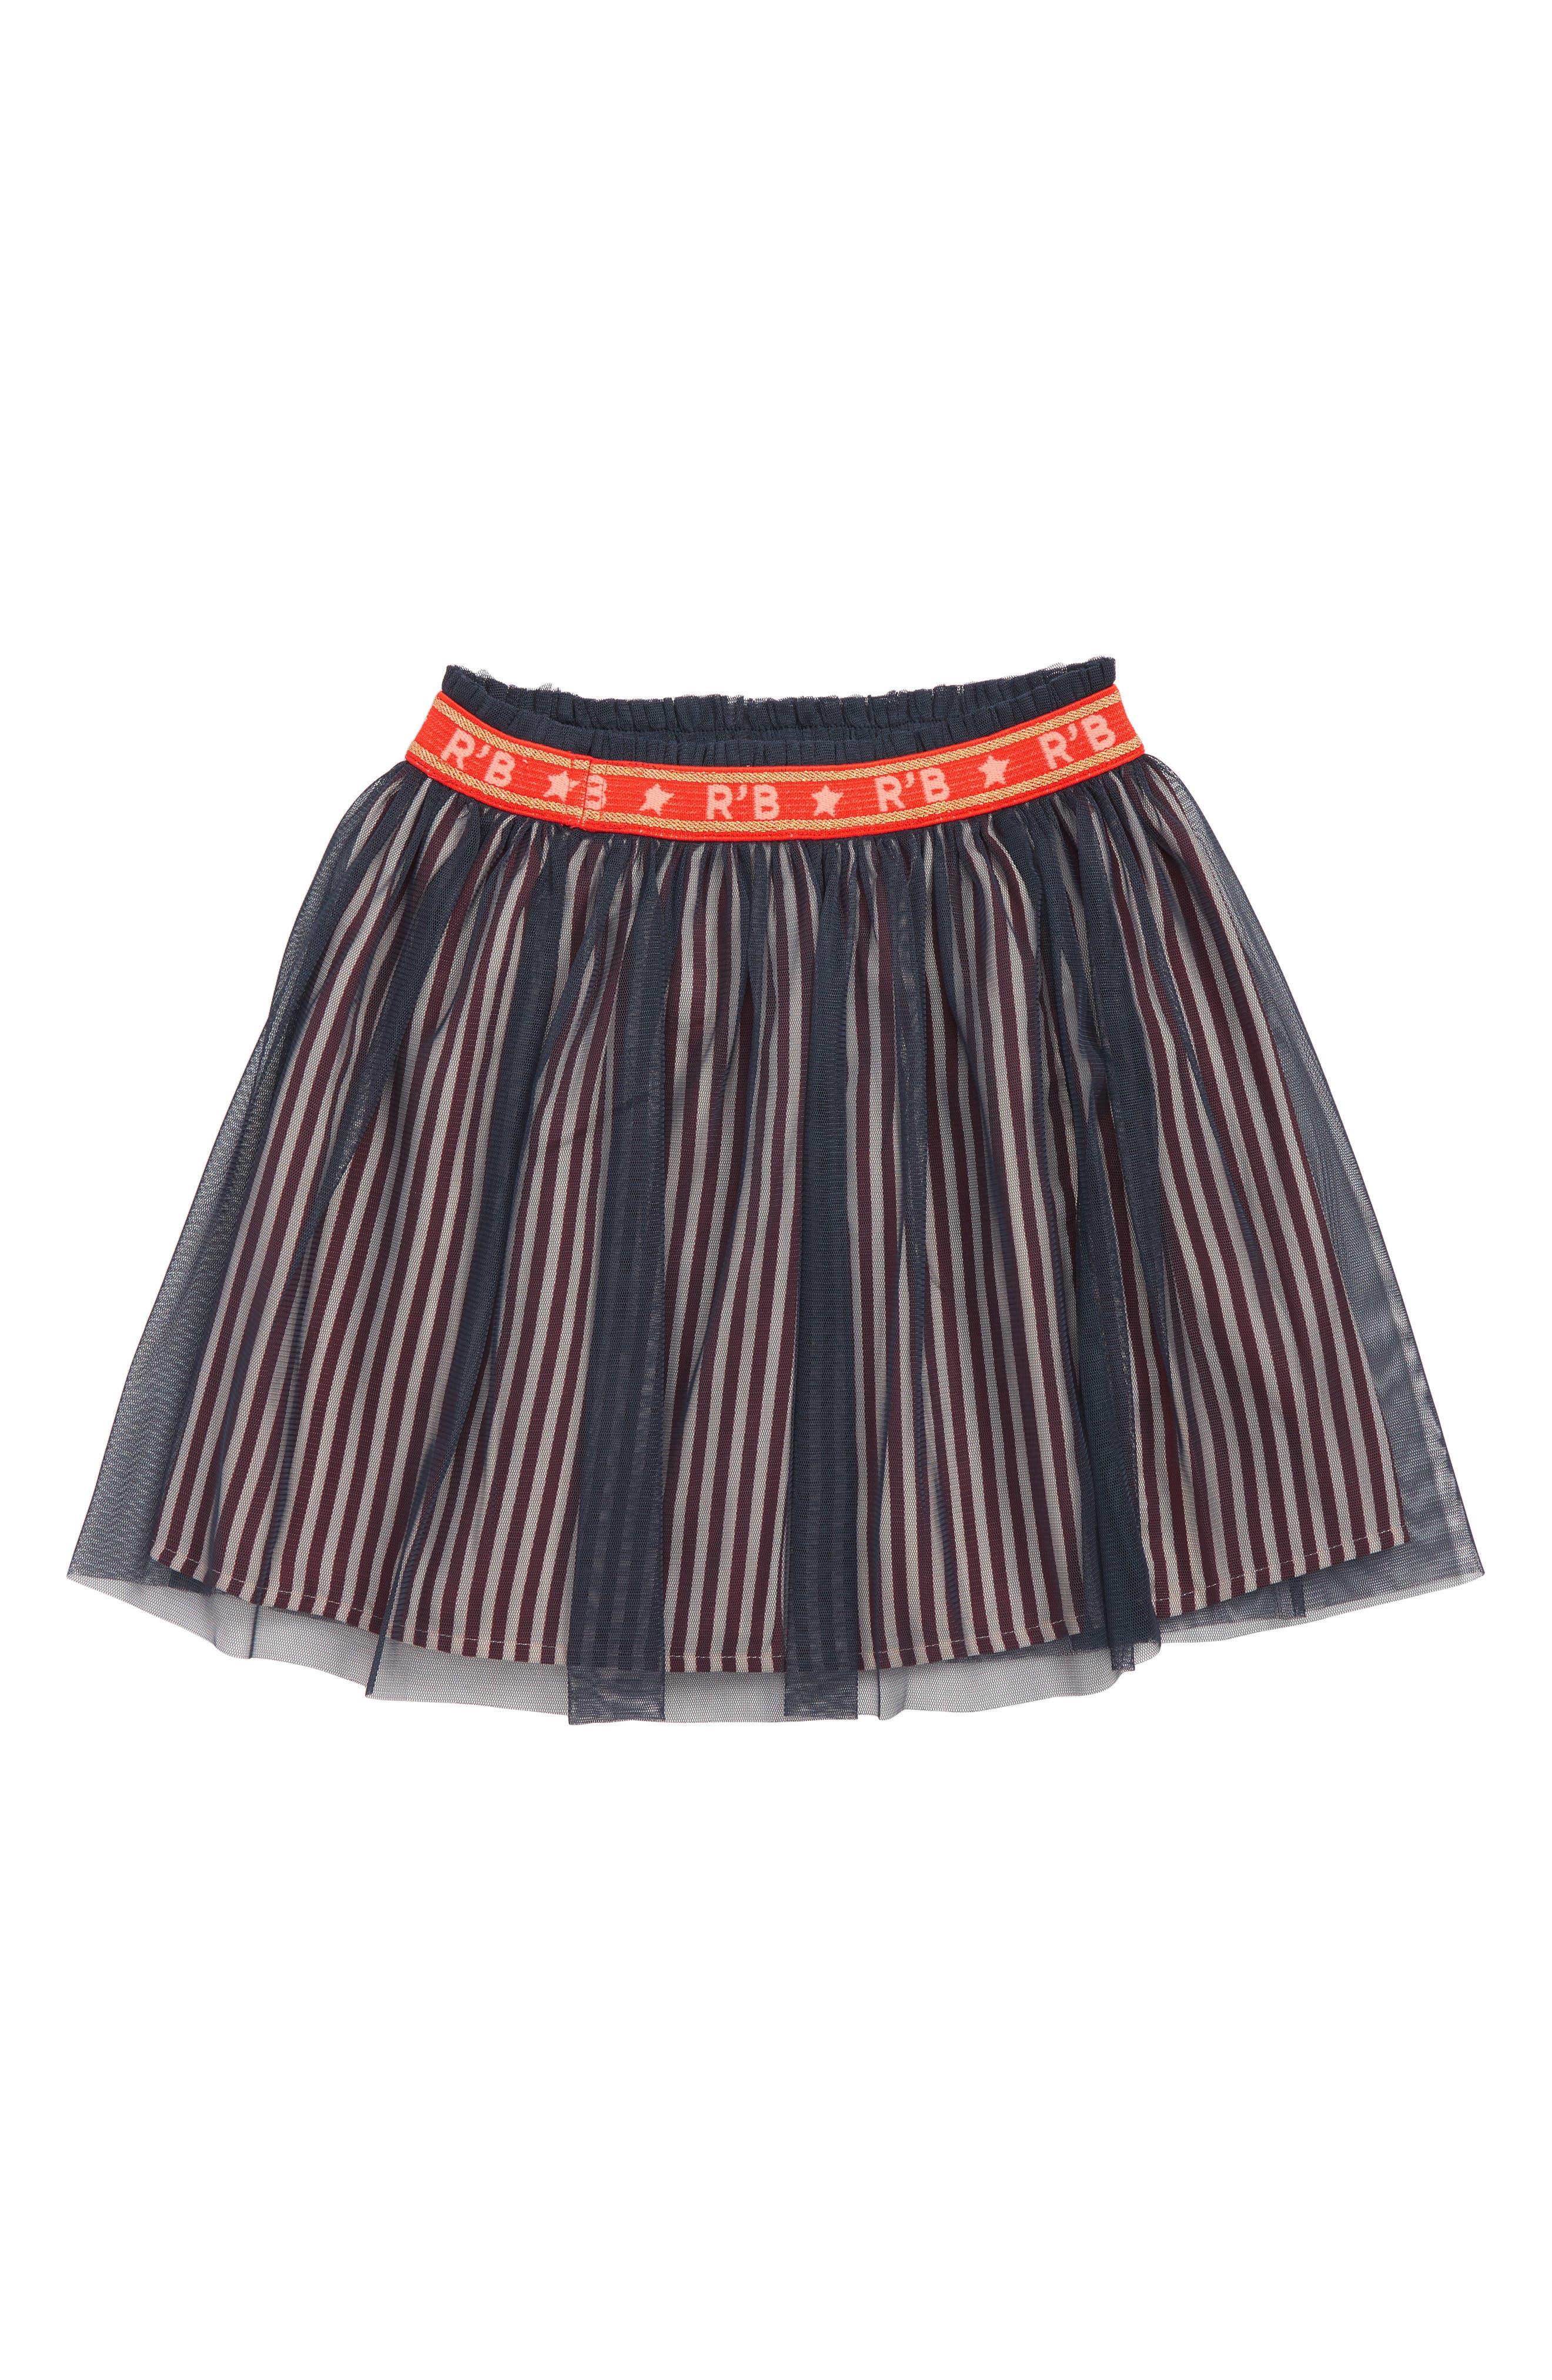 SCOTCH R'BELLE Tulle Skirt, Main, color, 593 N